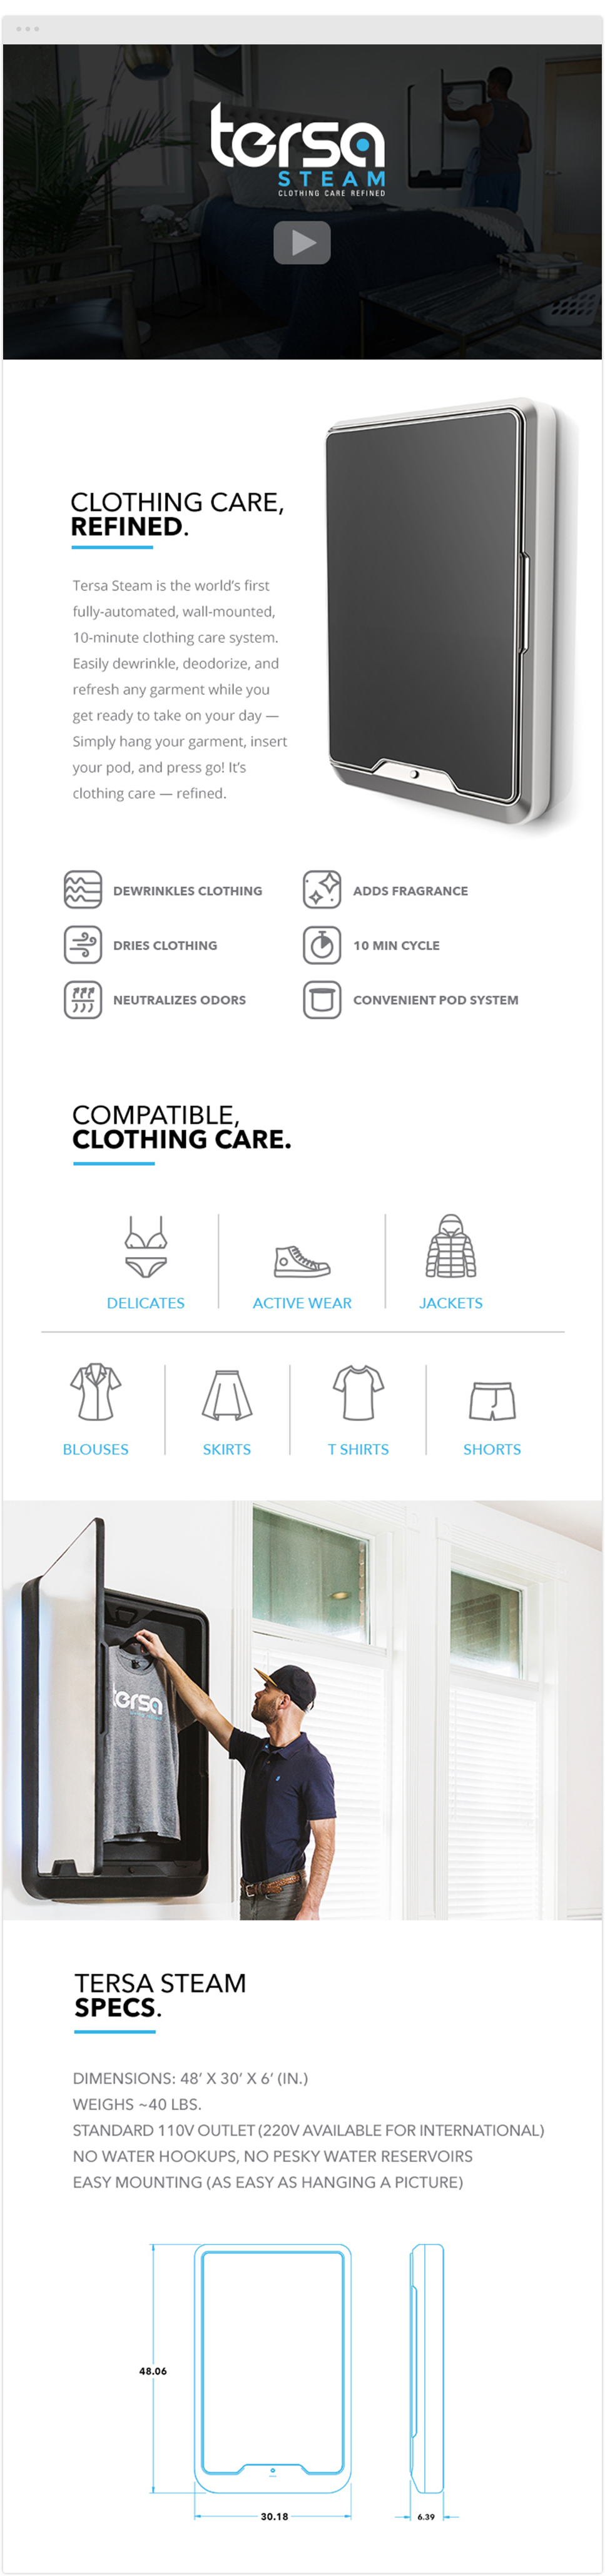 tersa product one-sheet print design